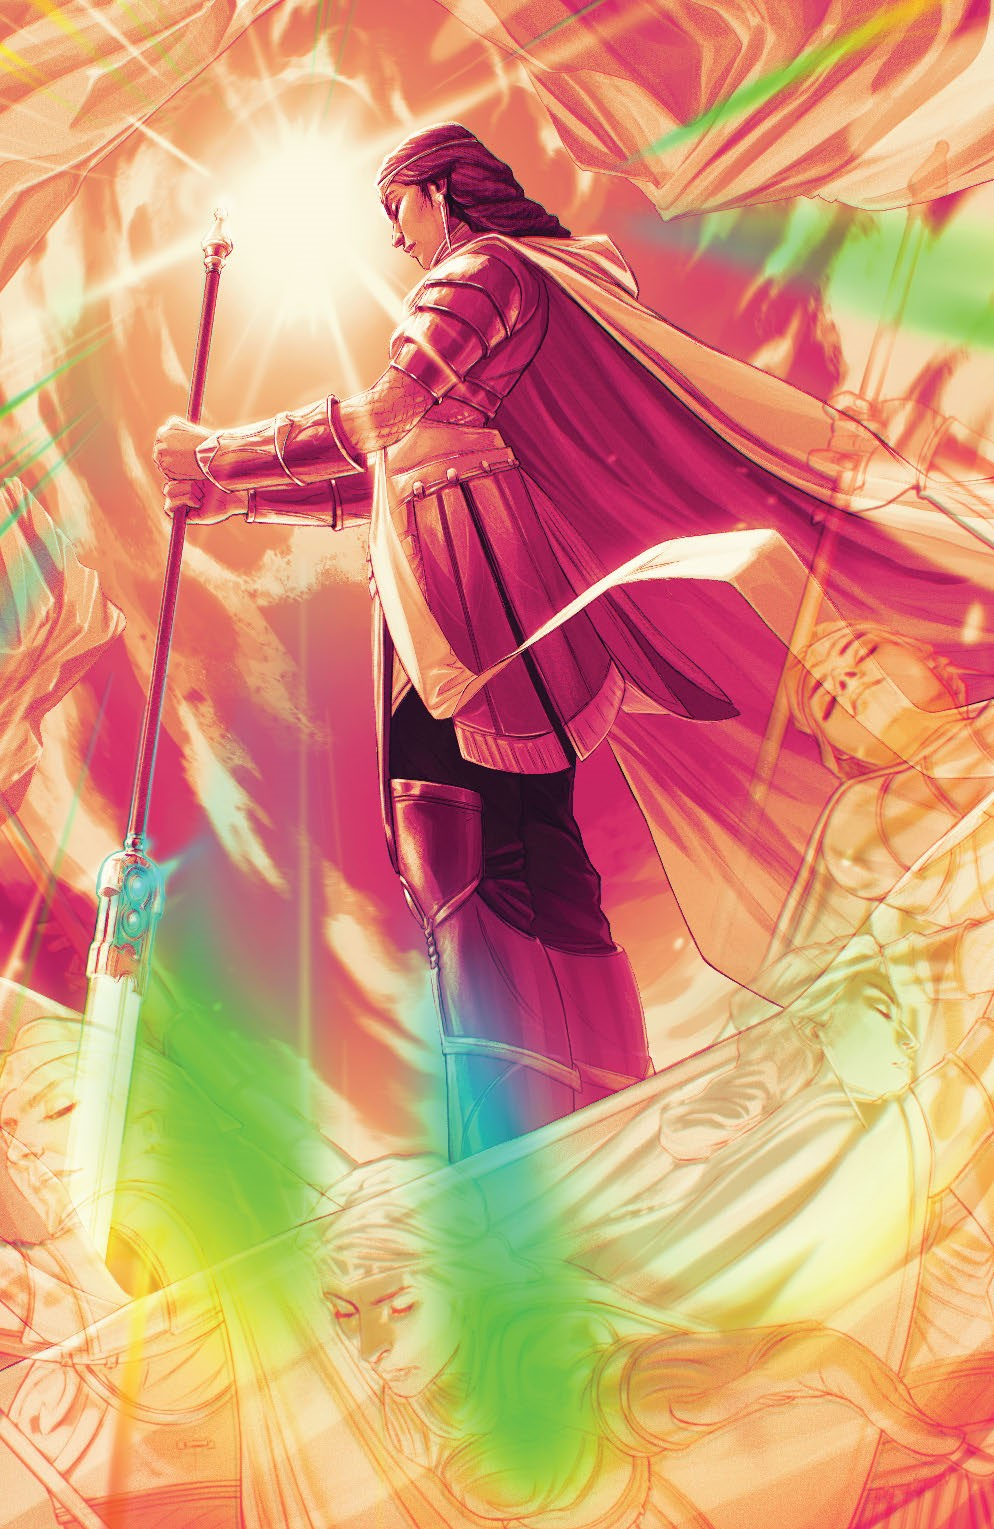 Magic_005_Cover_B2_Planeswalker ComicList Previews: MAGIC #5